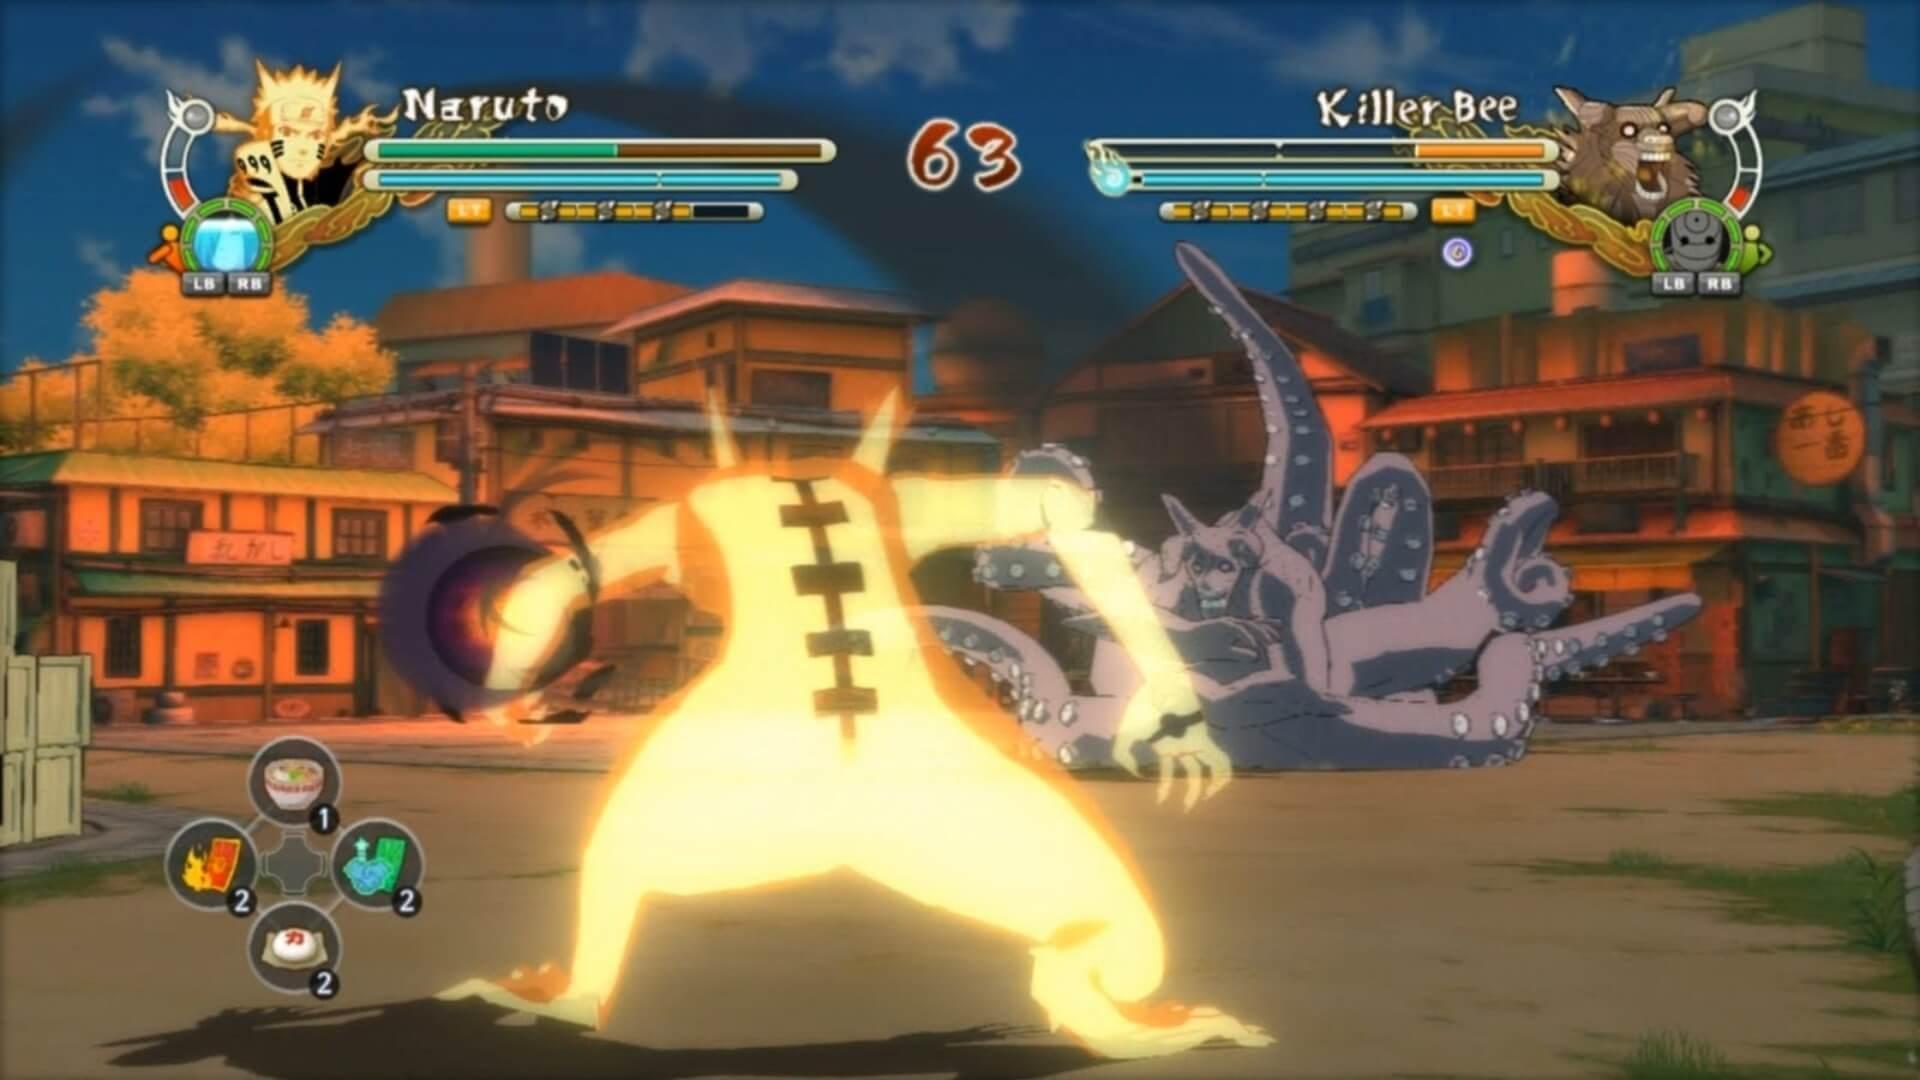 download naruto shippuden ultimate ninja storm 3 for pc free